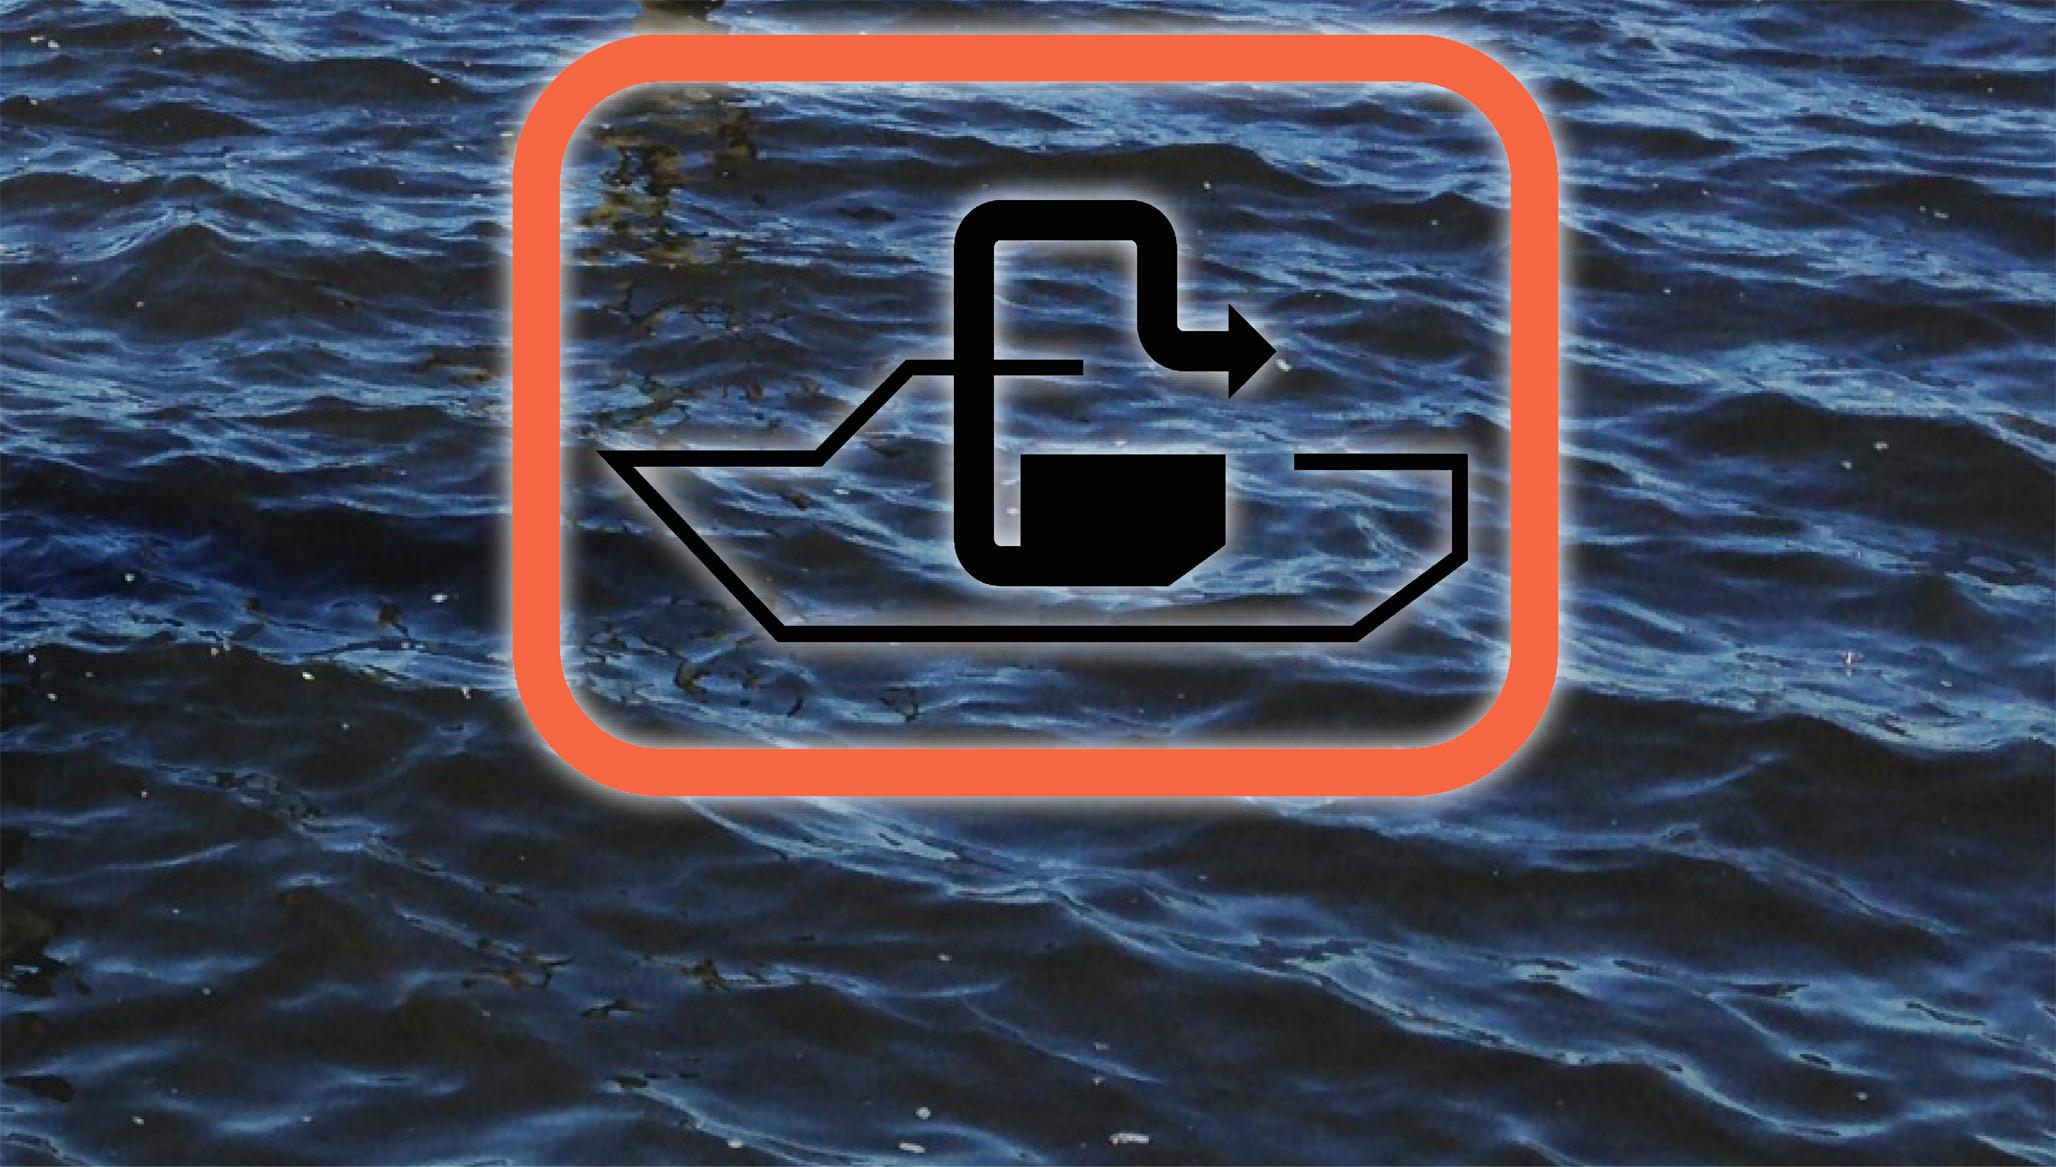 applications-marinepumps-small-.jpg